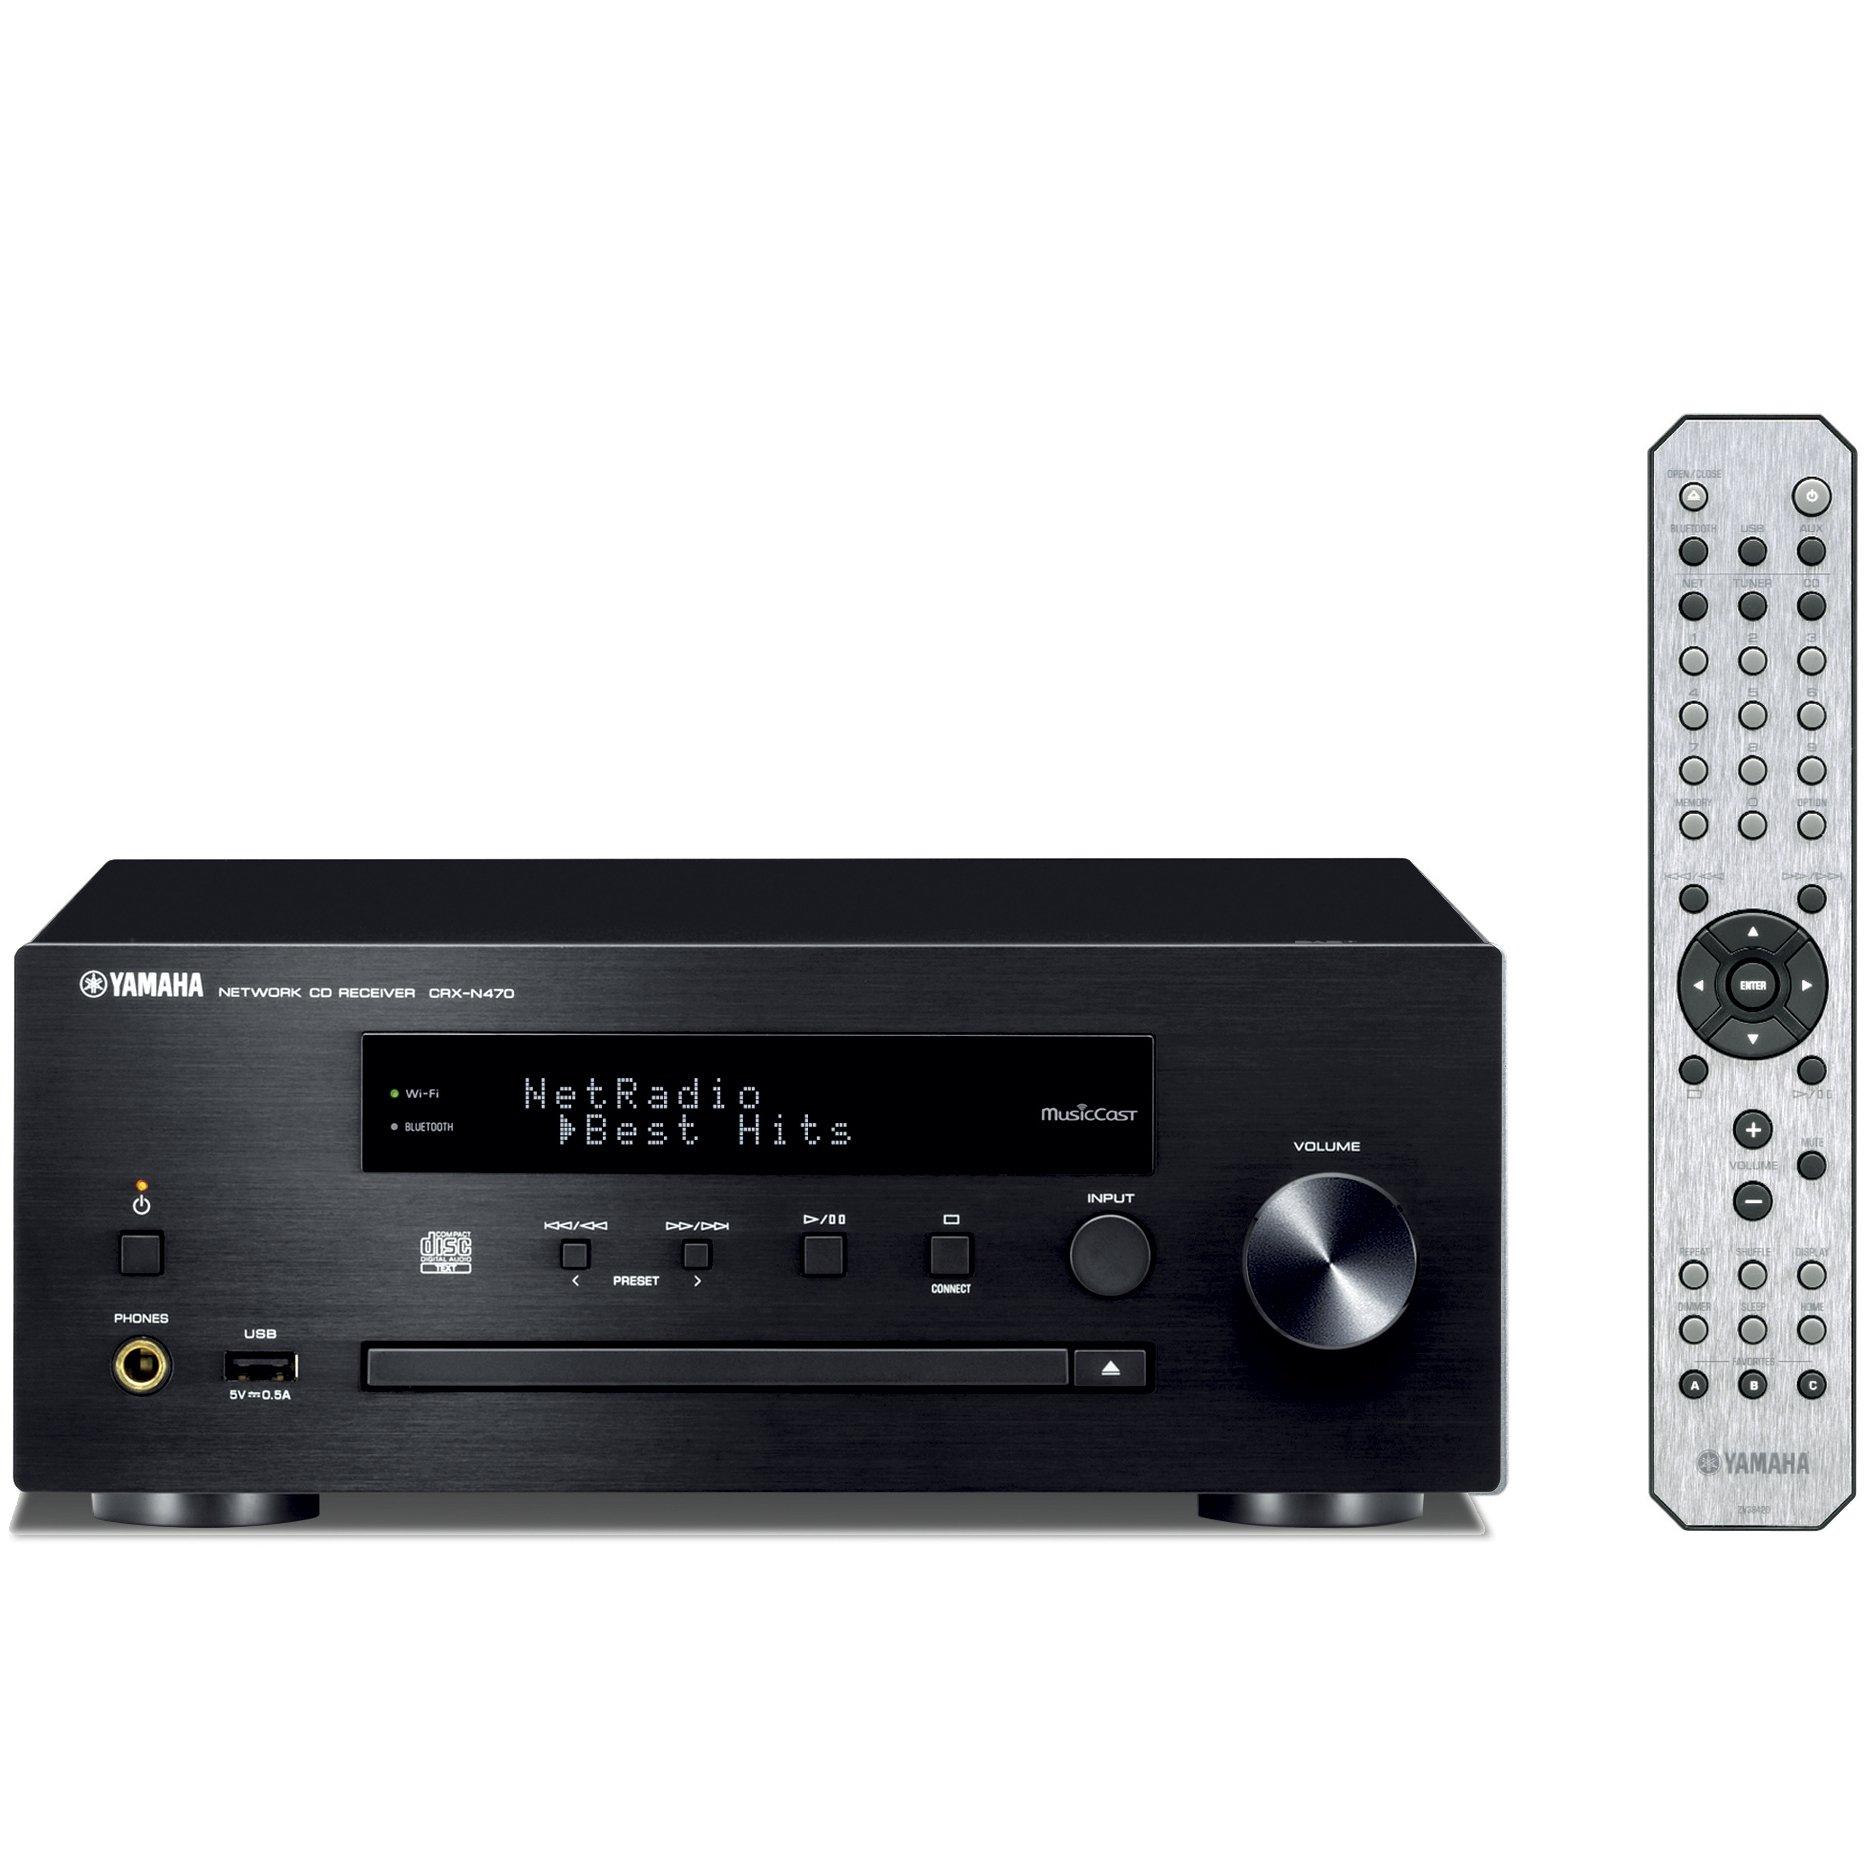 YAMAHA network CD receiver Wi-Fi built-in CRX-N470 (B) (Black) (Japan domestic model)